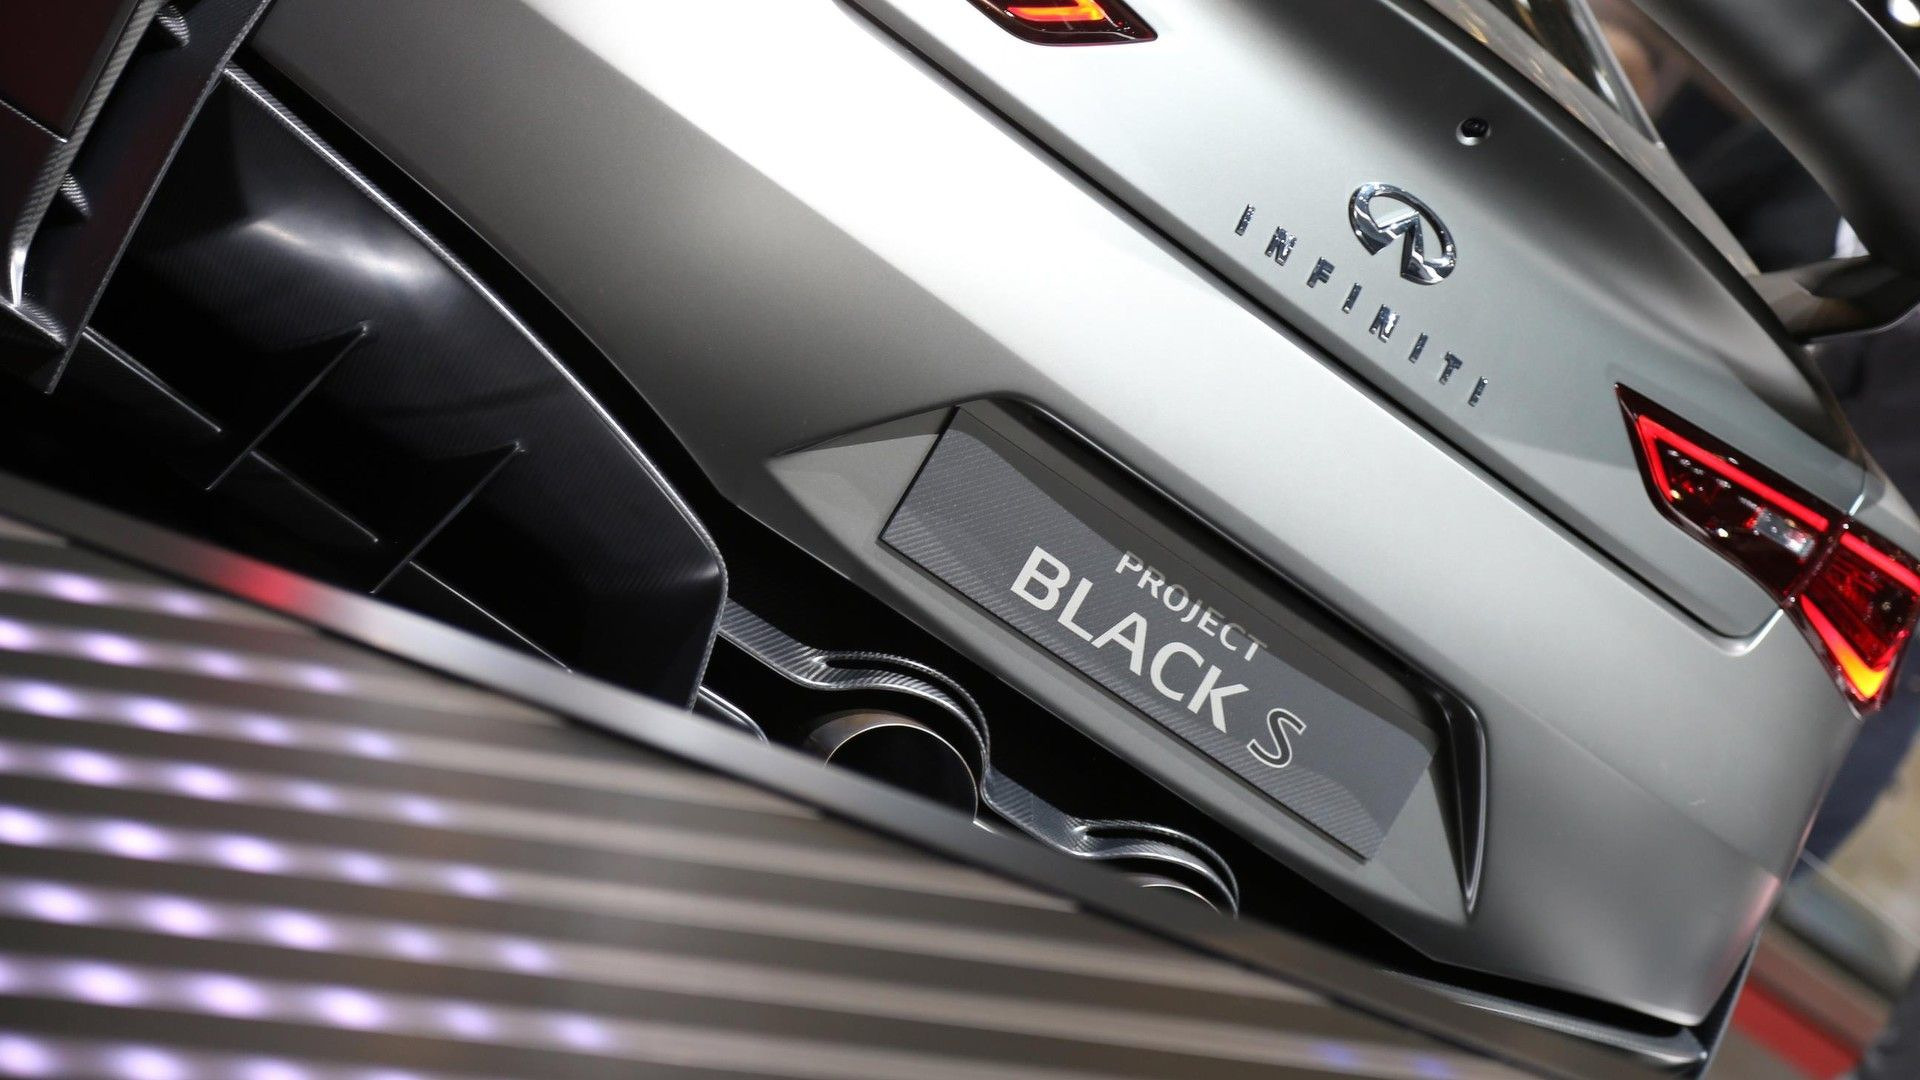 infiniti-q60-project-black-s-concept (5)